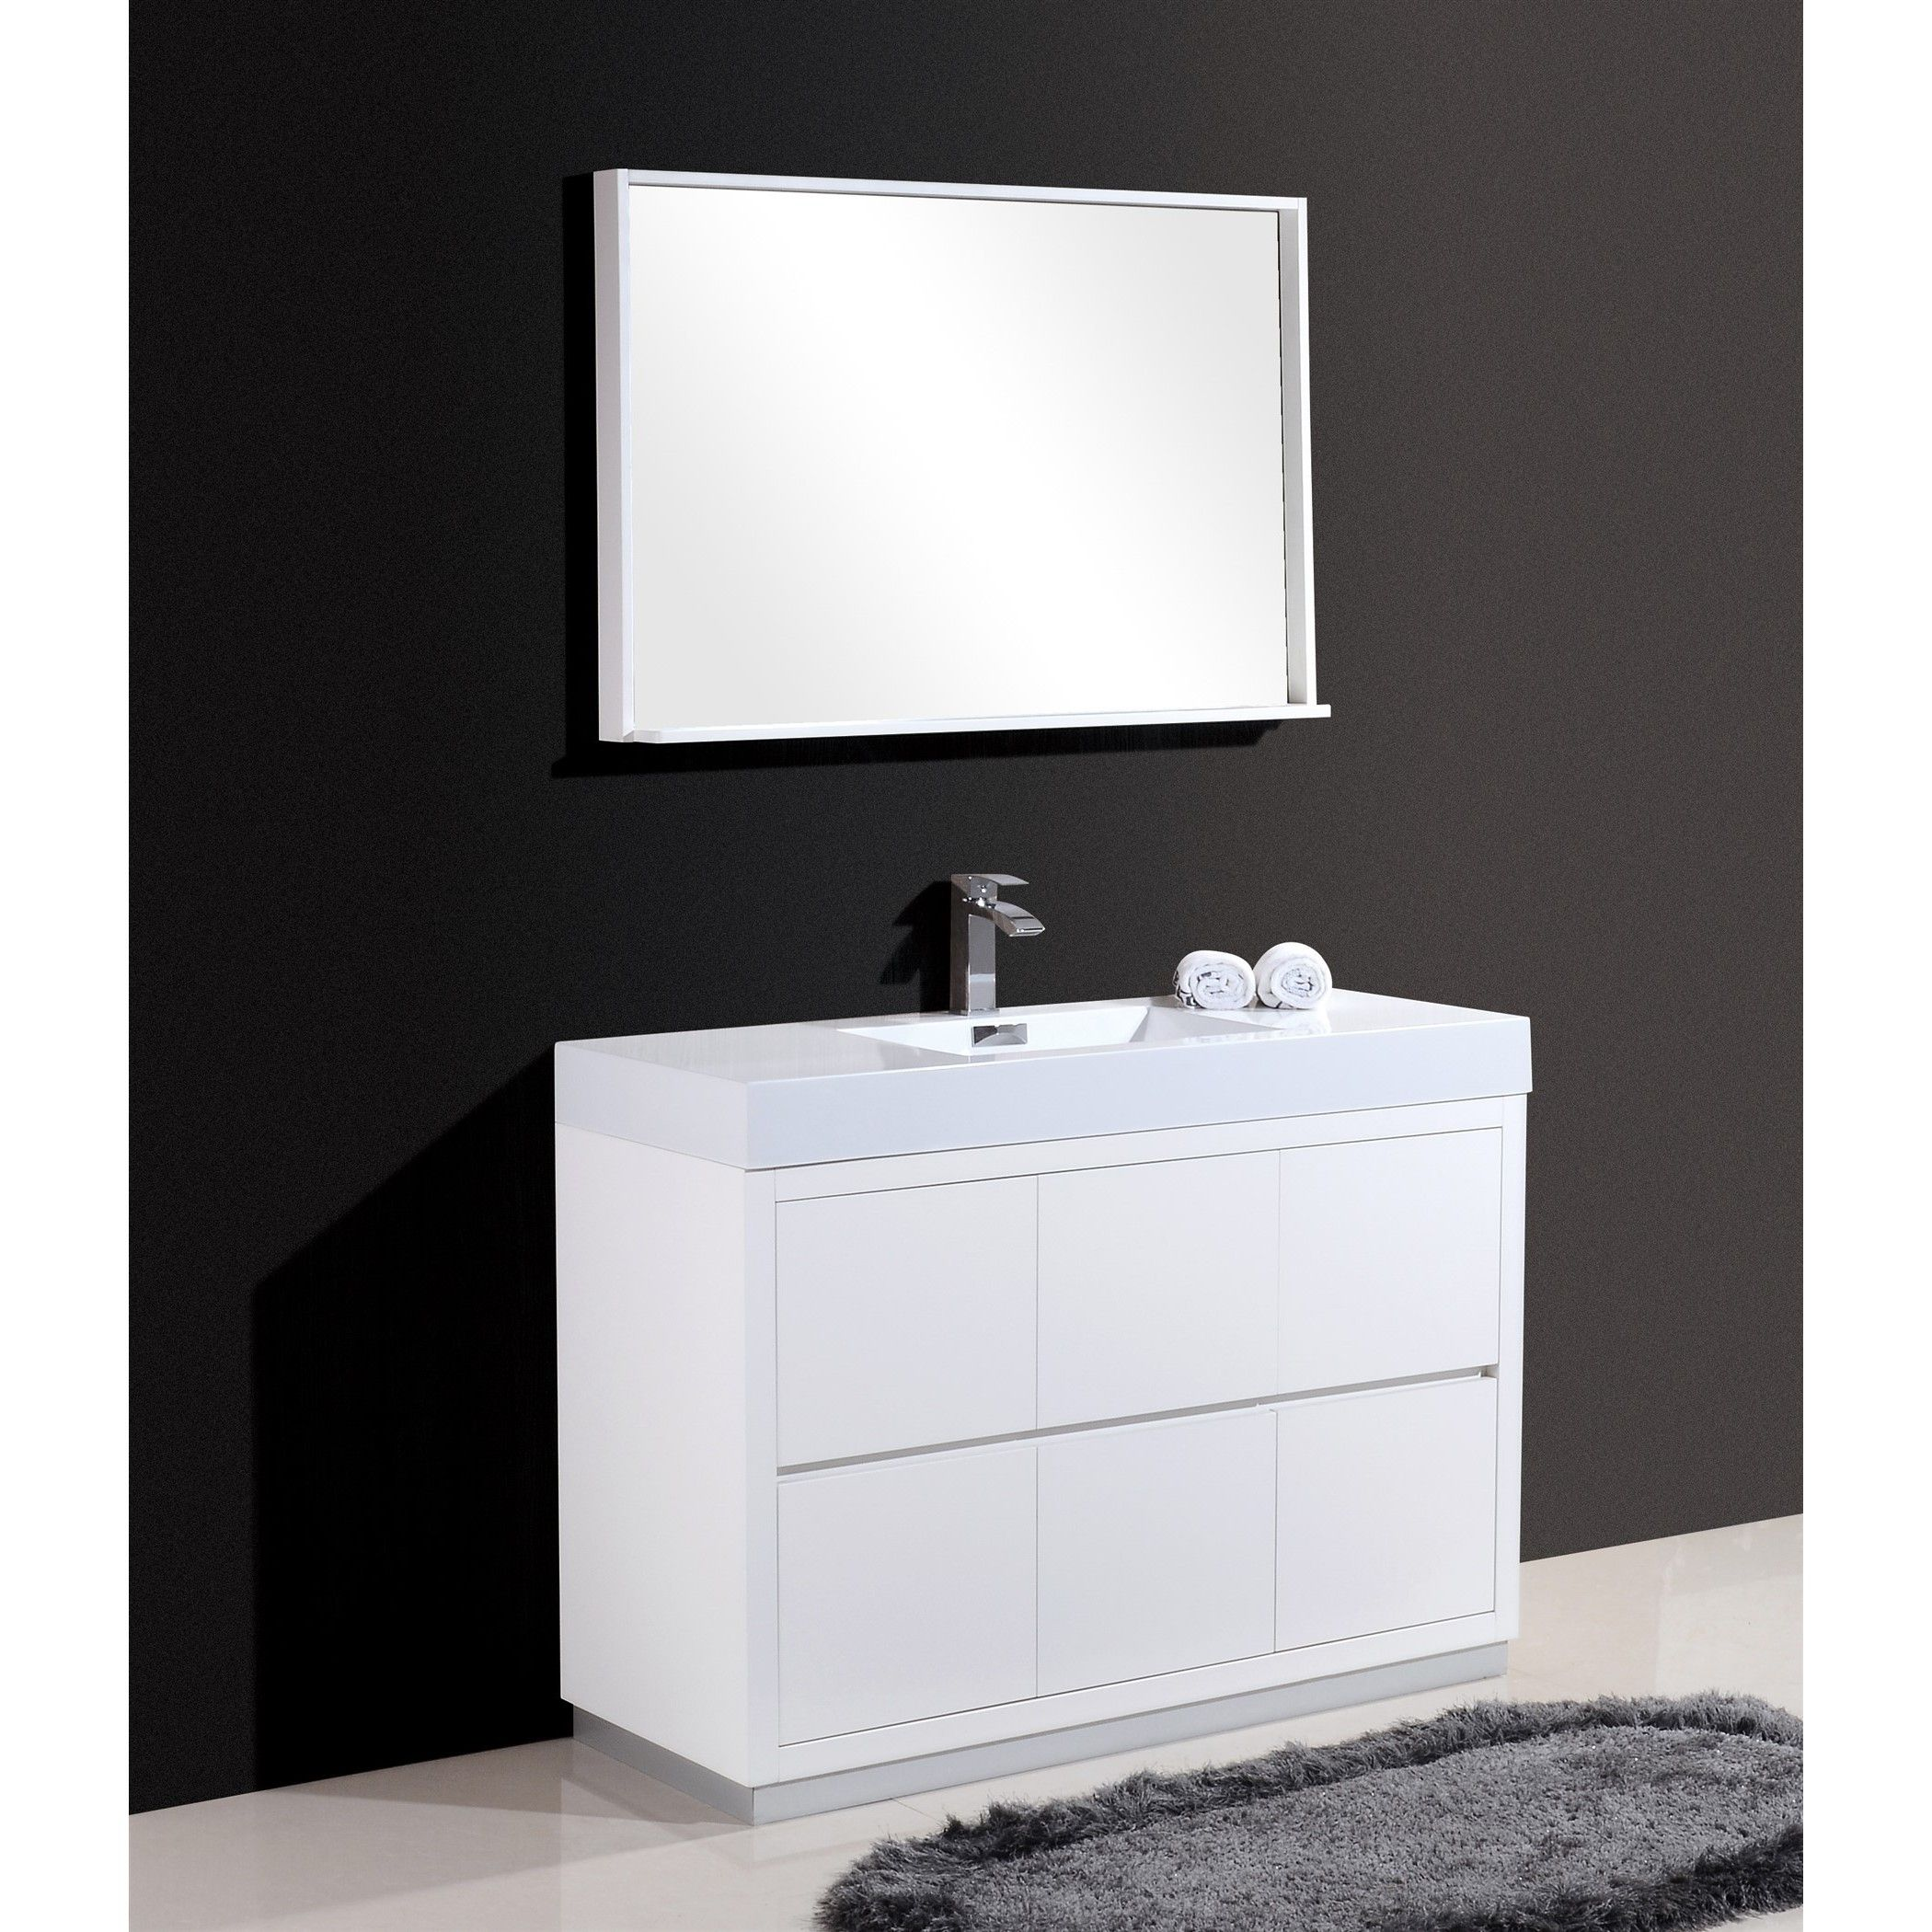 Kube Bath KubeBath Bliss 48 inch Single sink Bathroom Vanity Gray